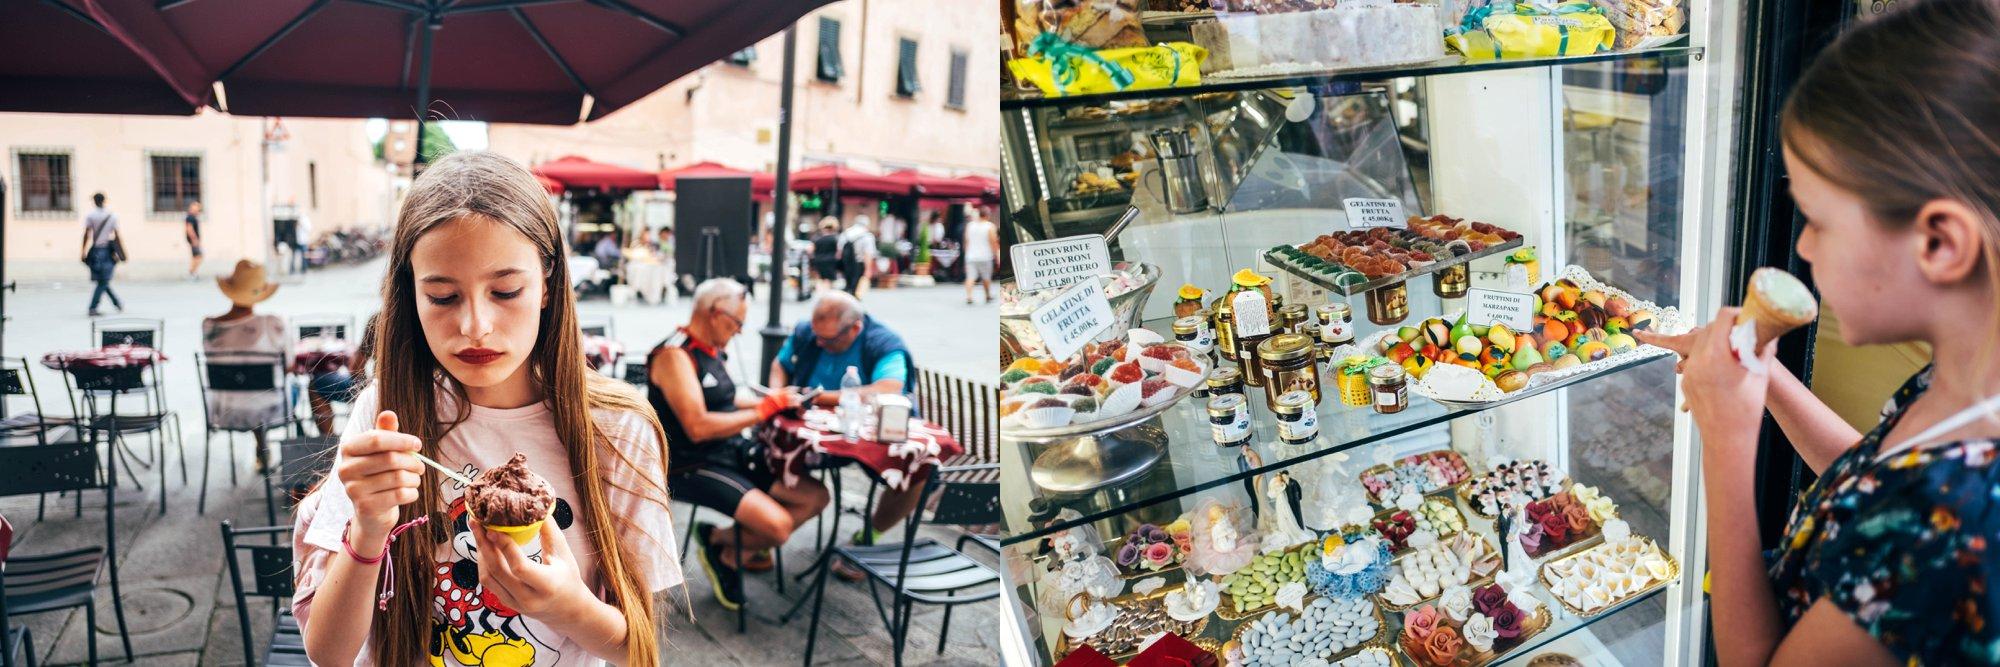 Eating Ice creams in Pisa Essex Documentary Travel Wedding Family Photographer